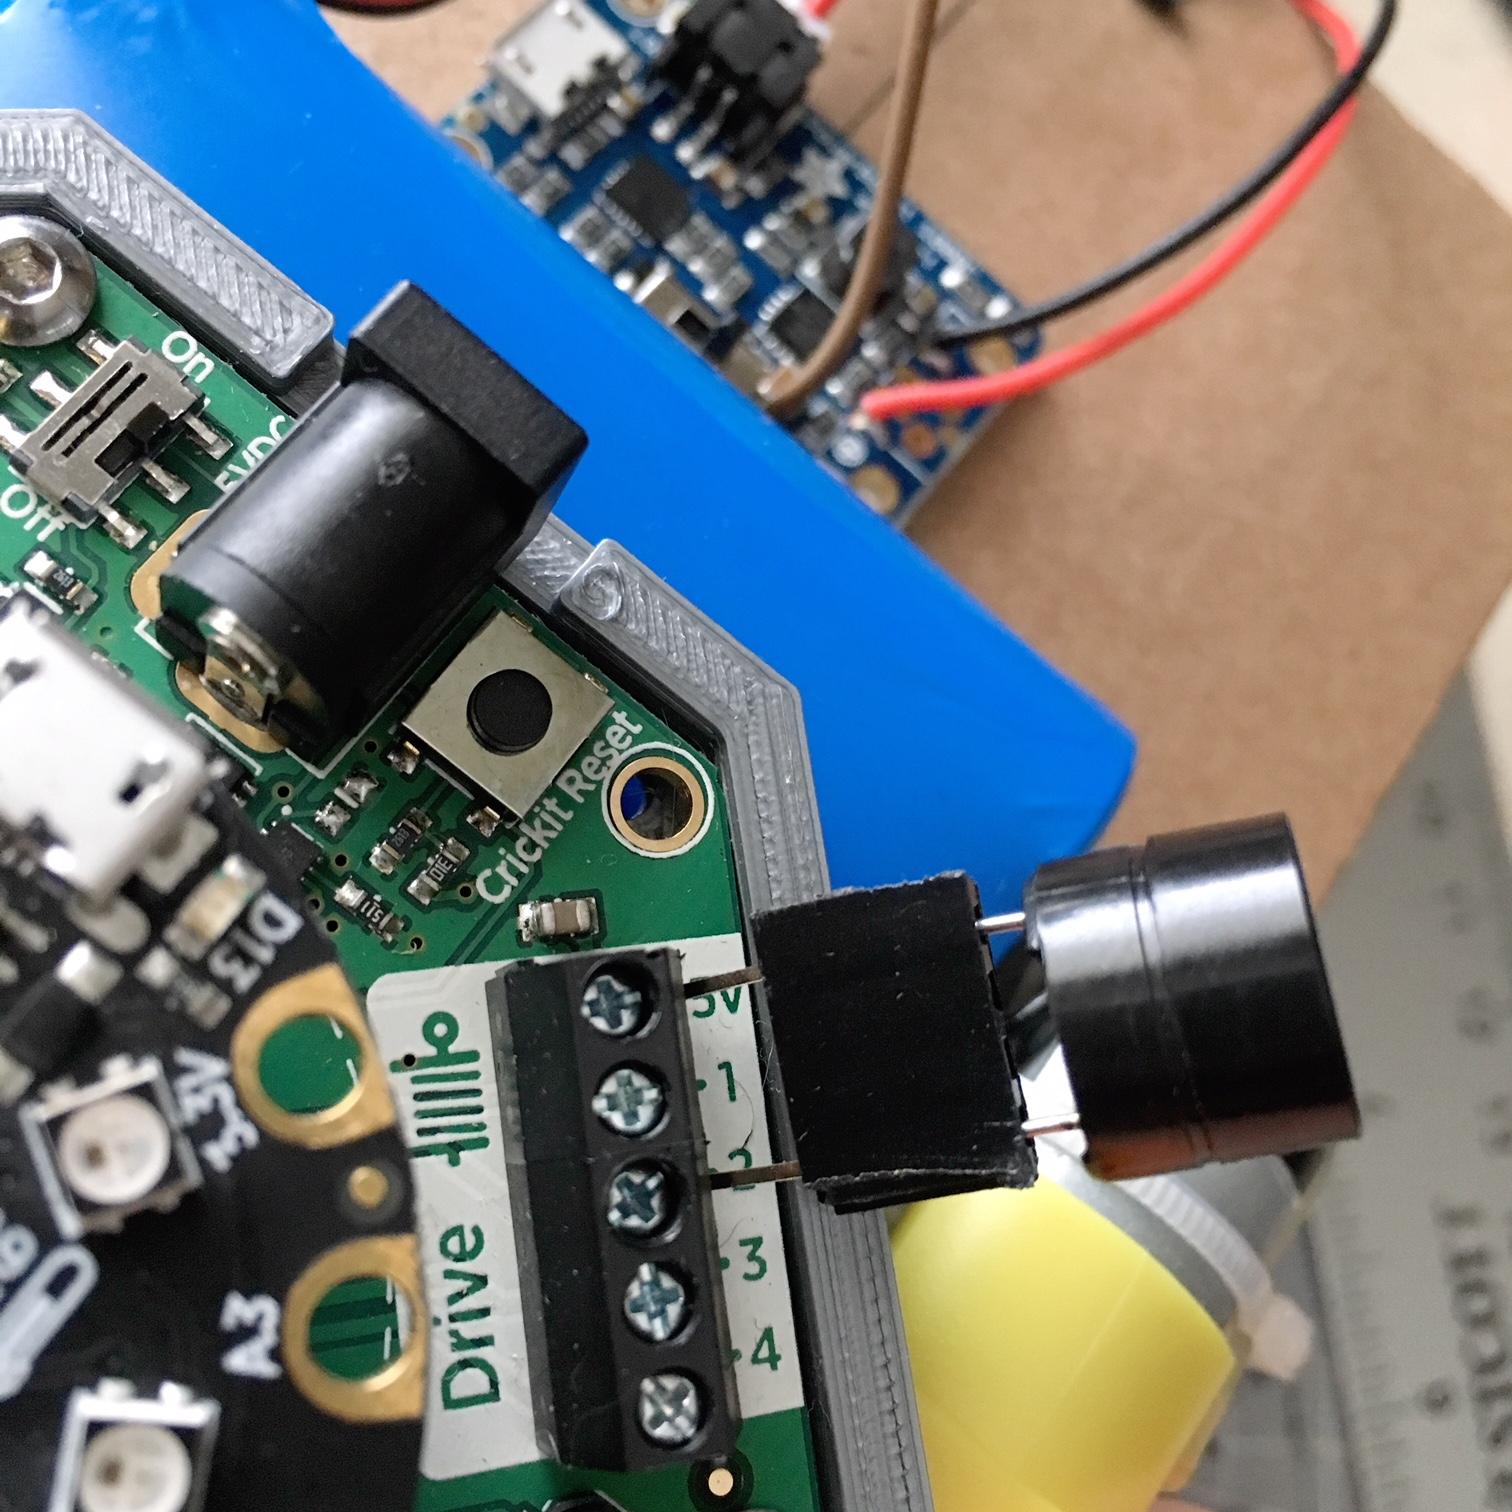 robotics___cnc_IMG_2185.jpg